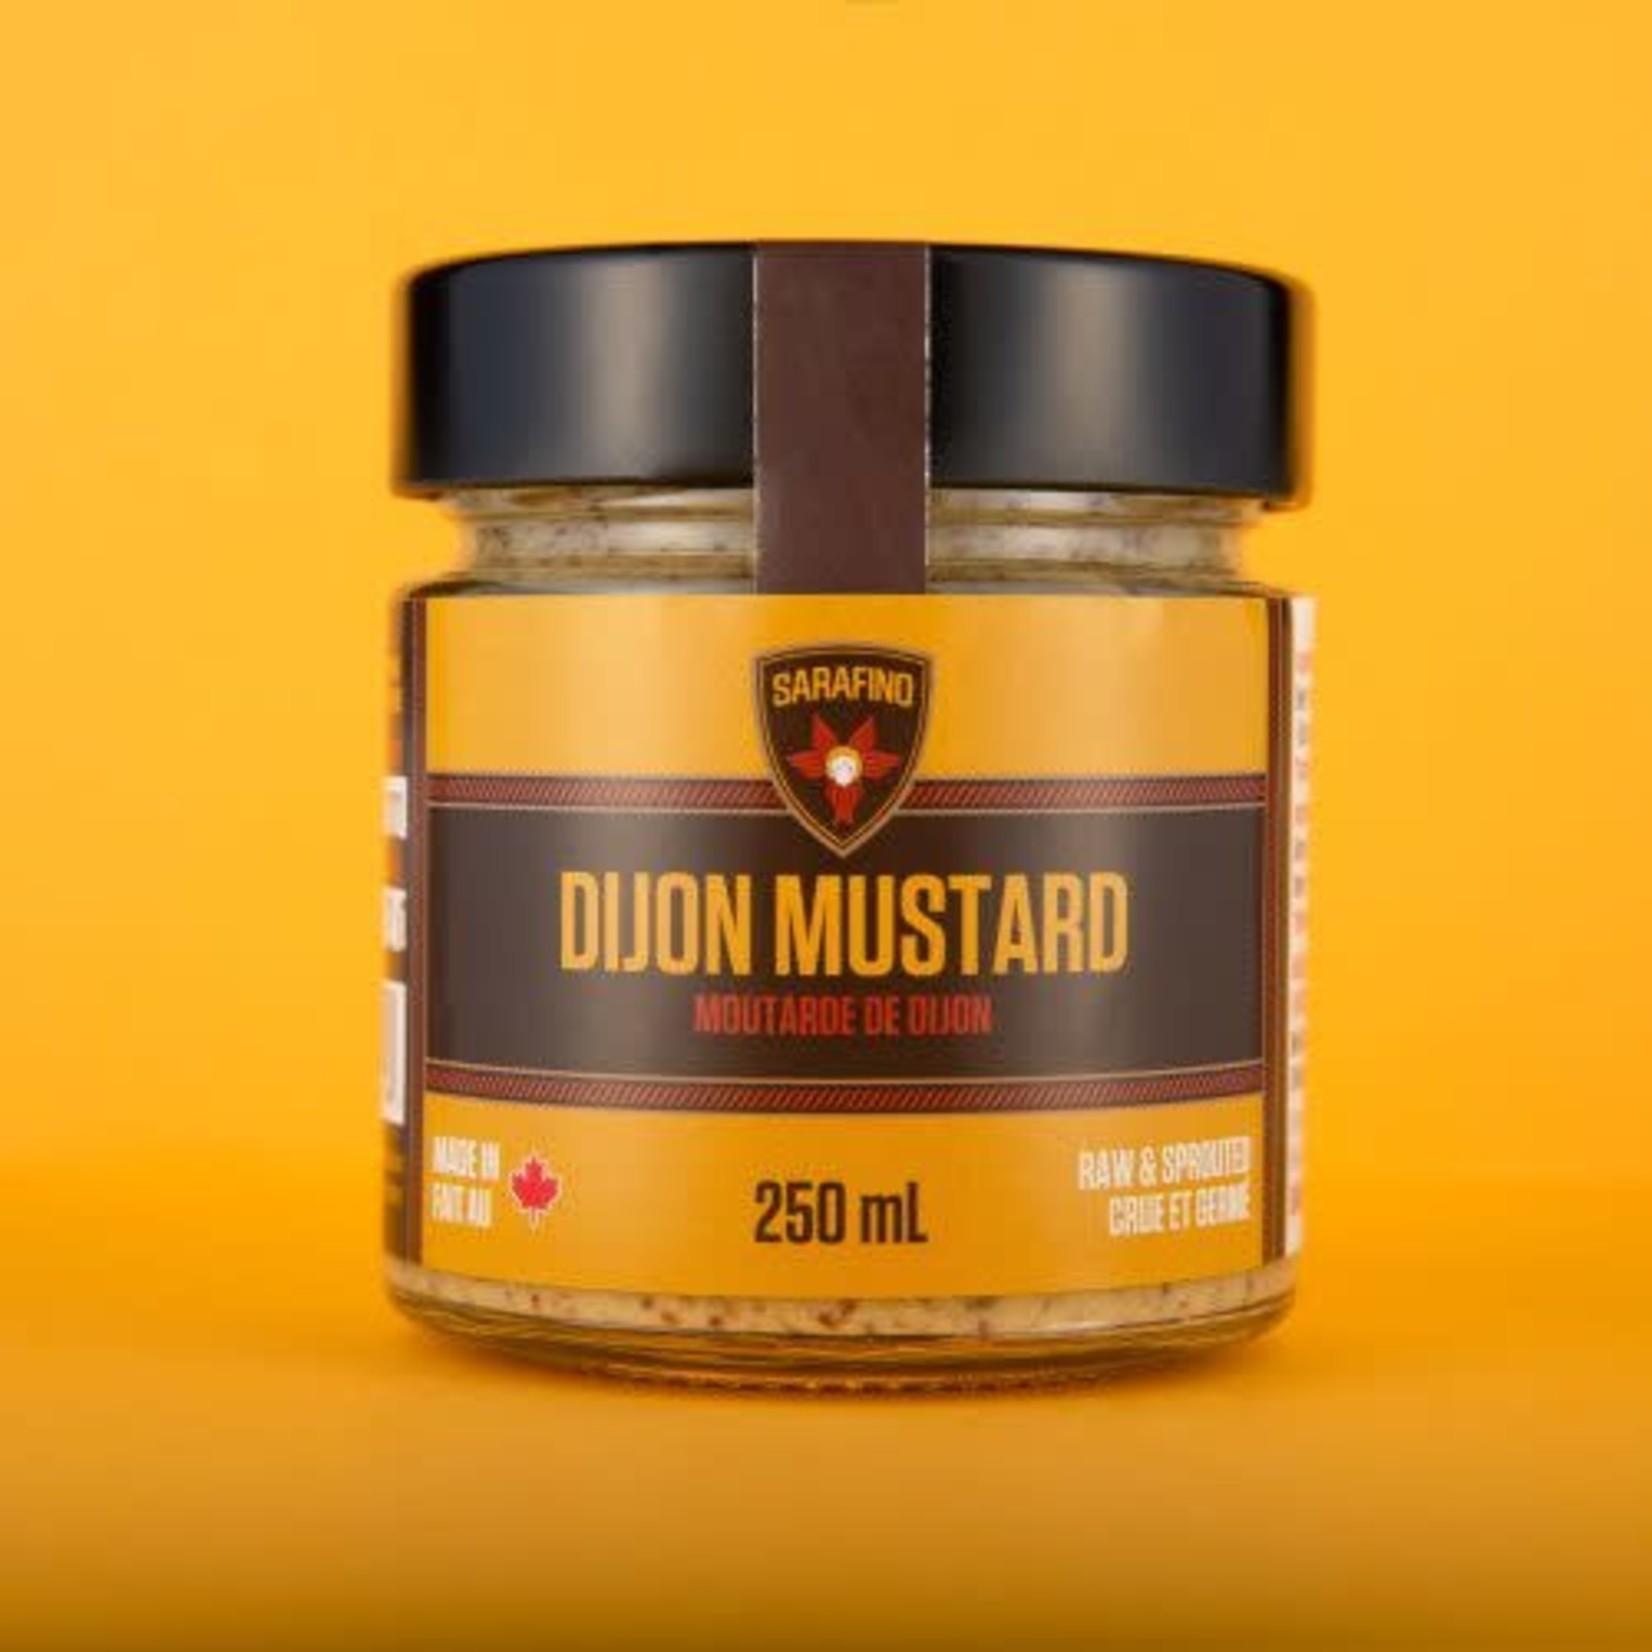 Sarafino Inc. Dijon Mustard 250ml